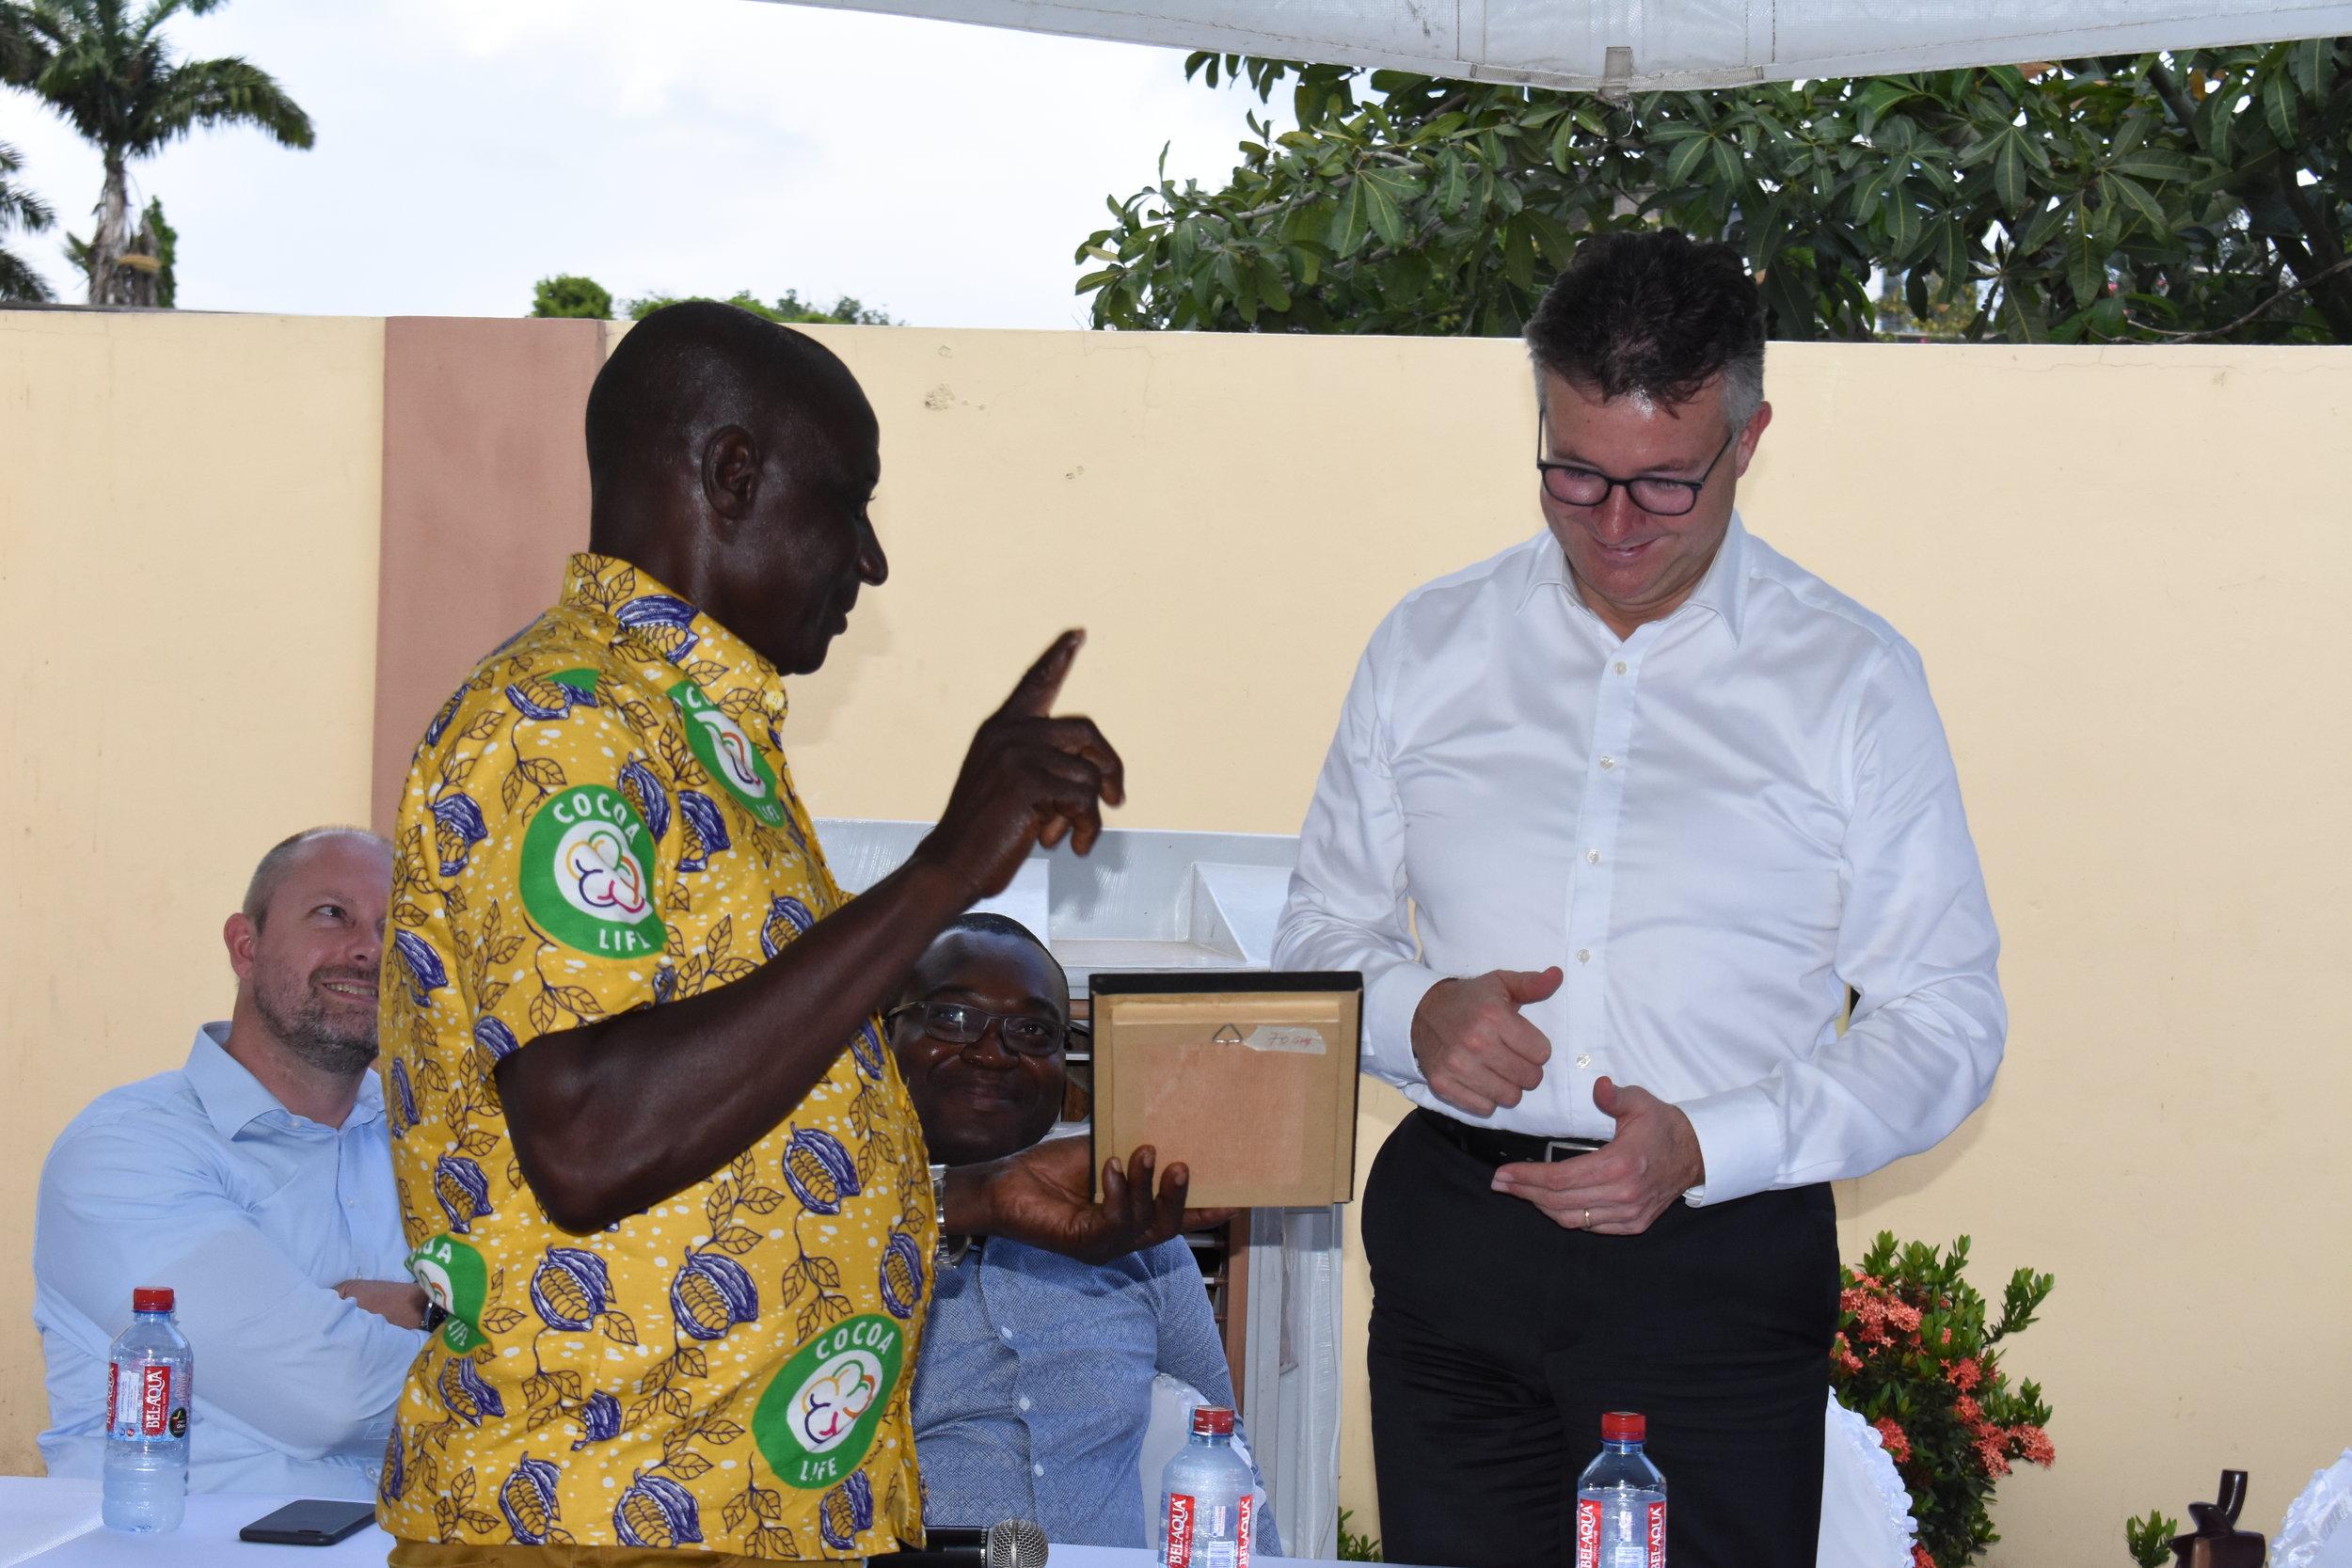 Presentation by Goaso Mondelez Farmers Cooperative, Nana Sarpong